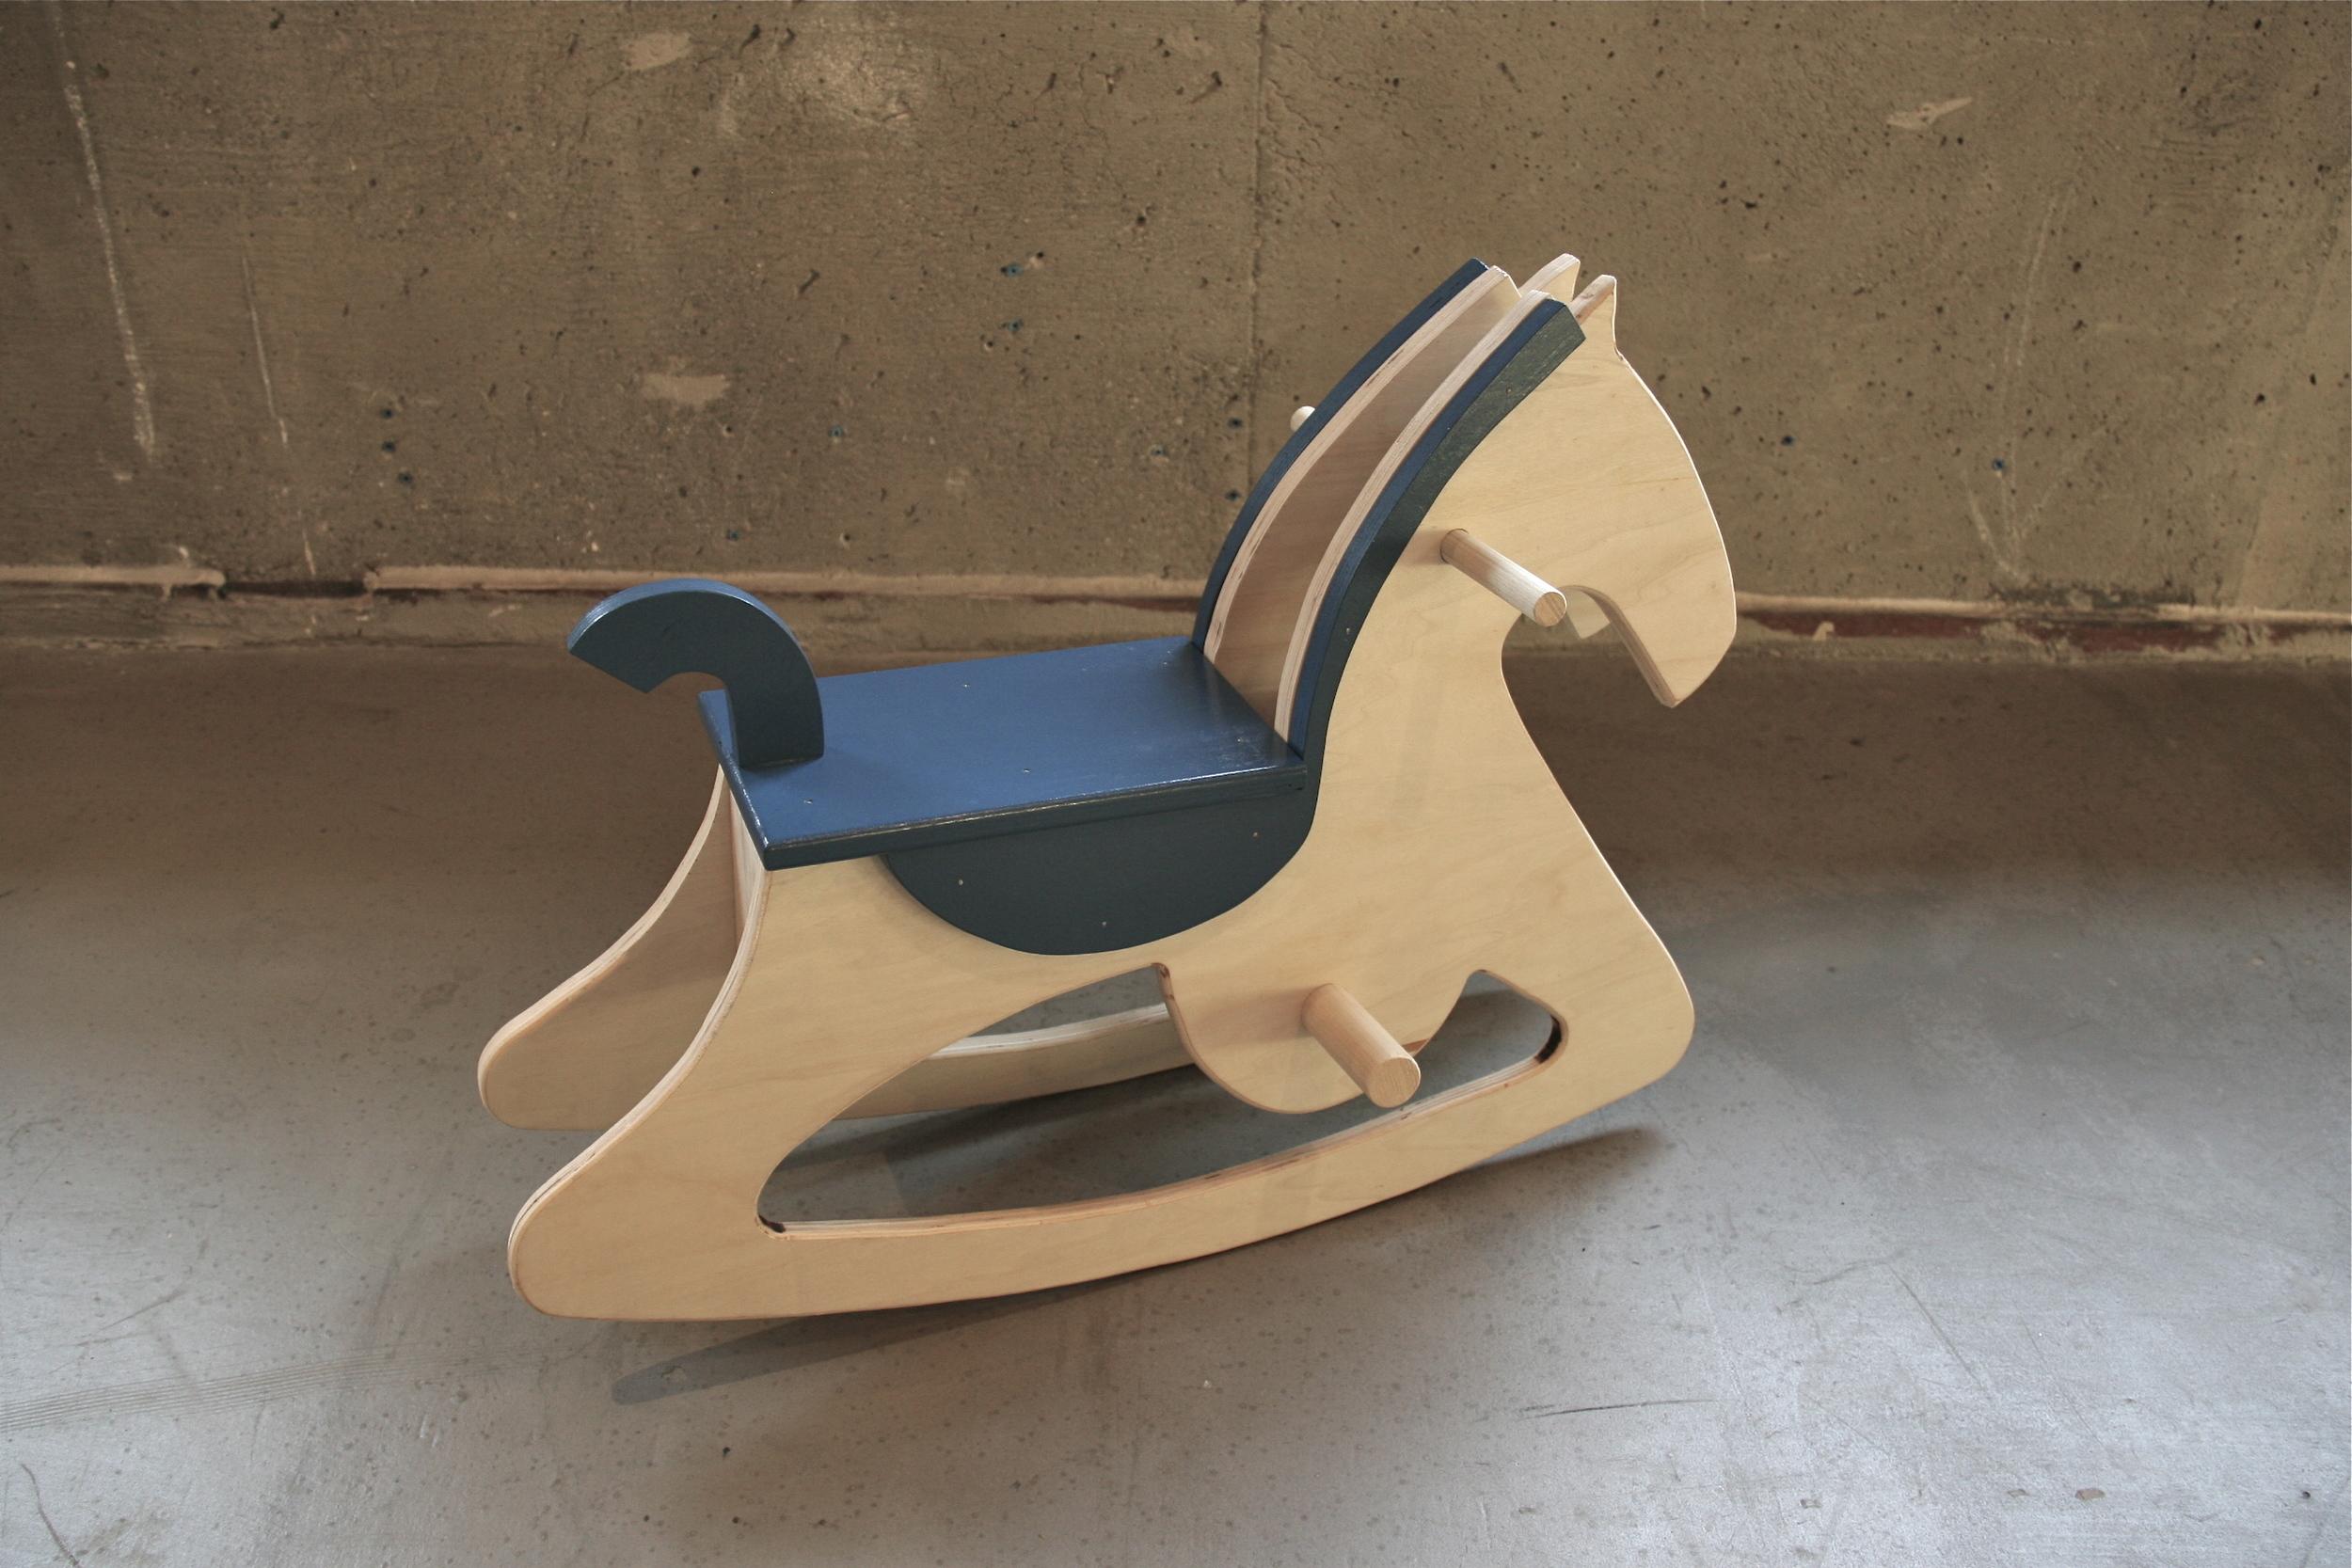 rockinghorse5.JPG